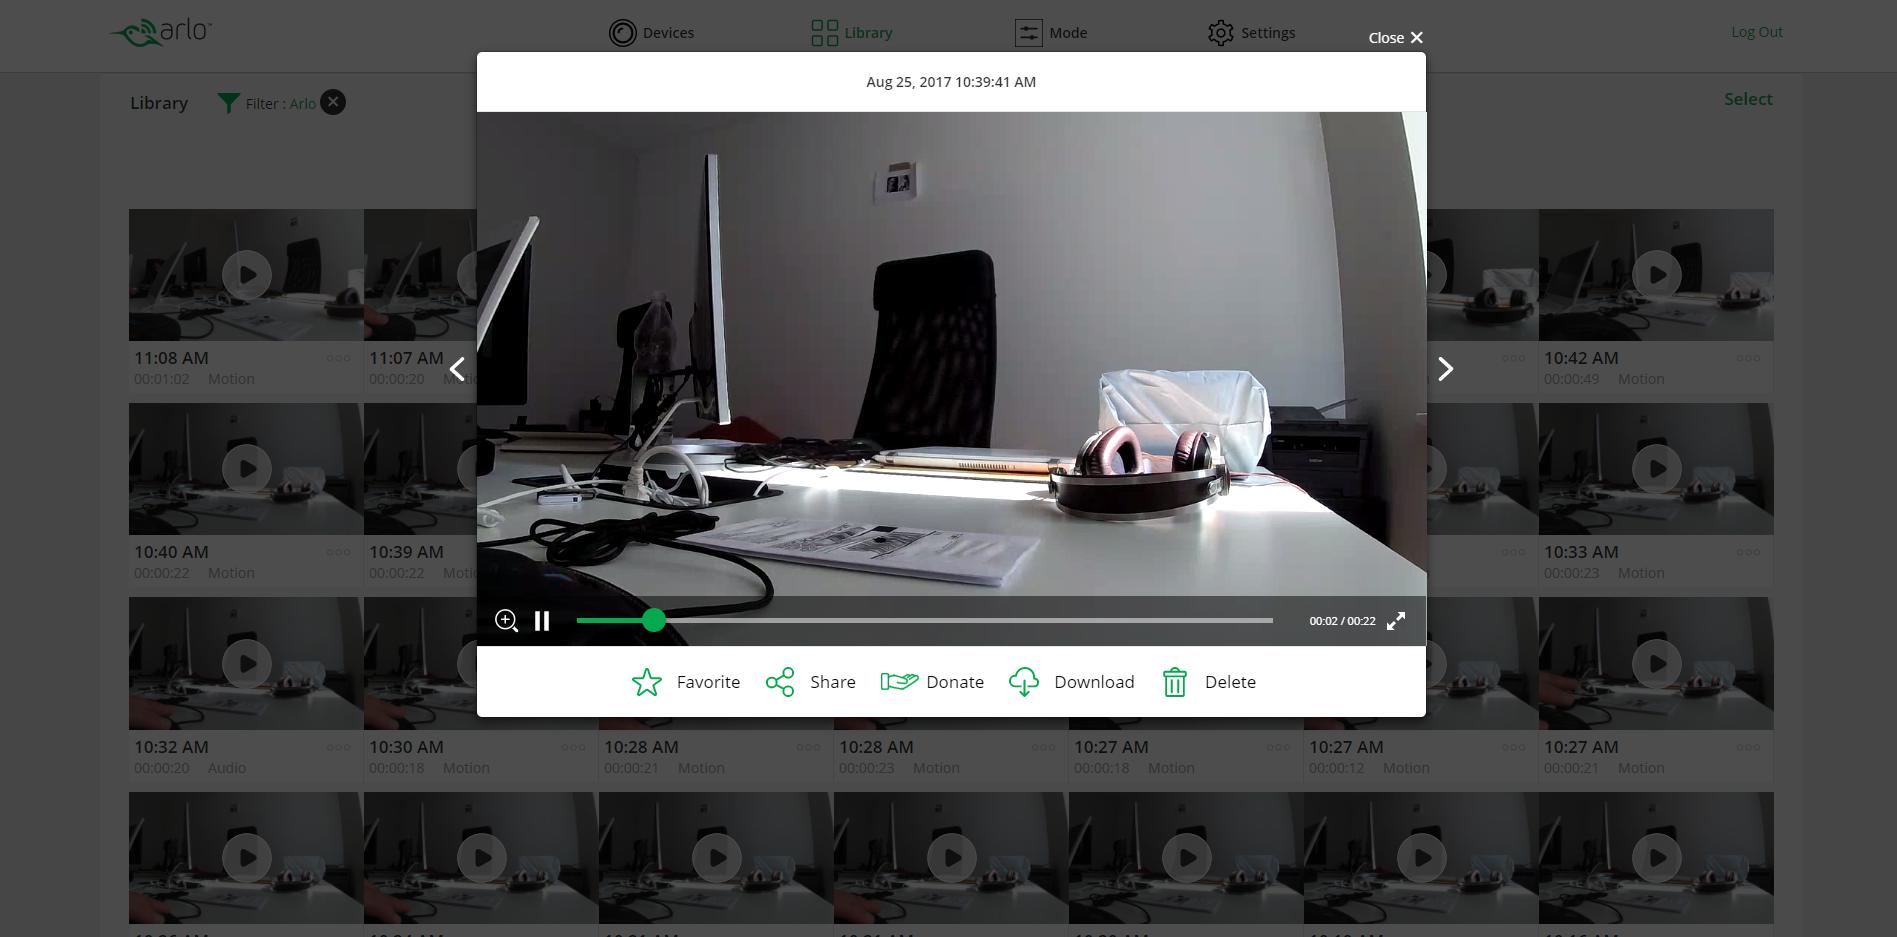 podgląd nagranego obrazu z kamery Netgear Arlo Baby